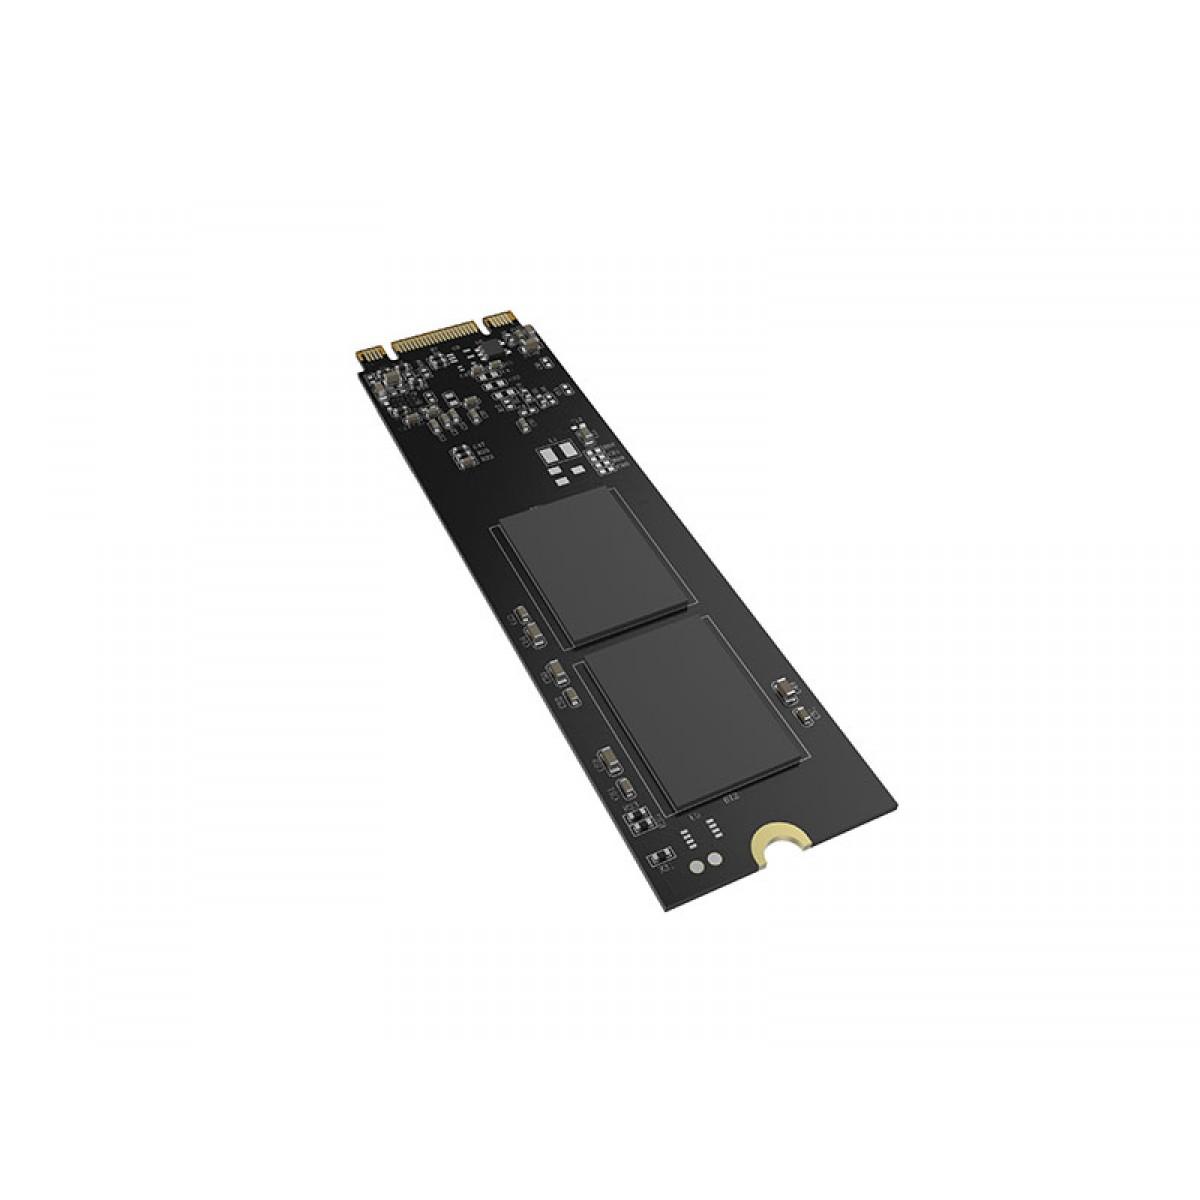 SSD Hikvision E100N 256GB, M.2 2280, Leitura 545MBs e Gravação 480MBs, HS-SSD-E100N-256GB